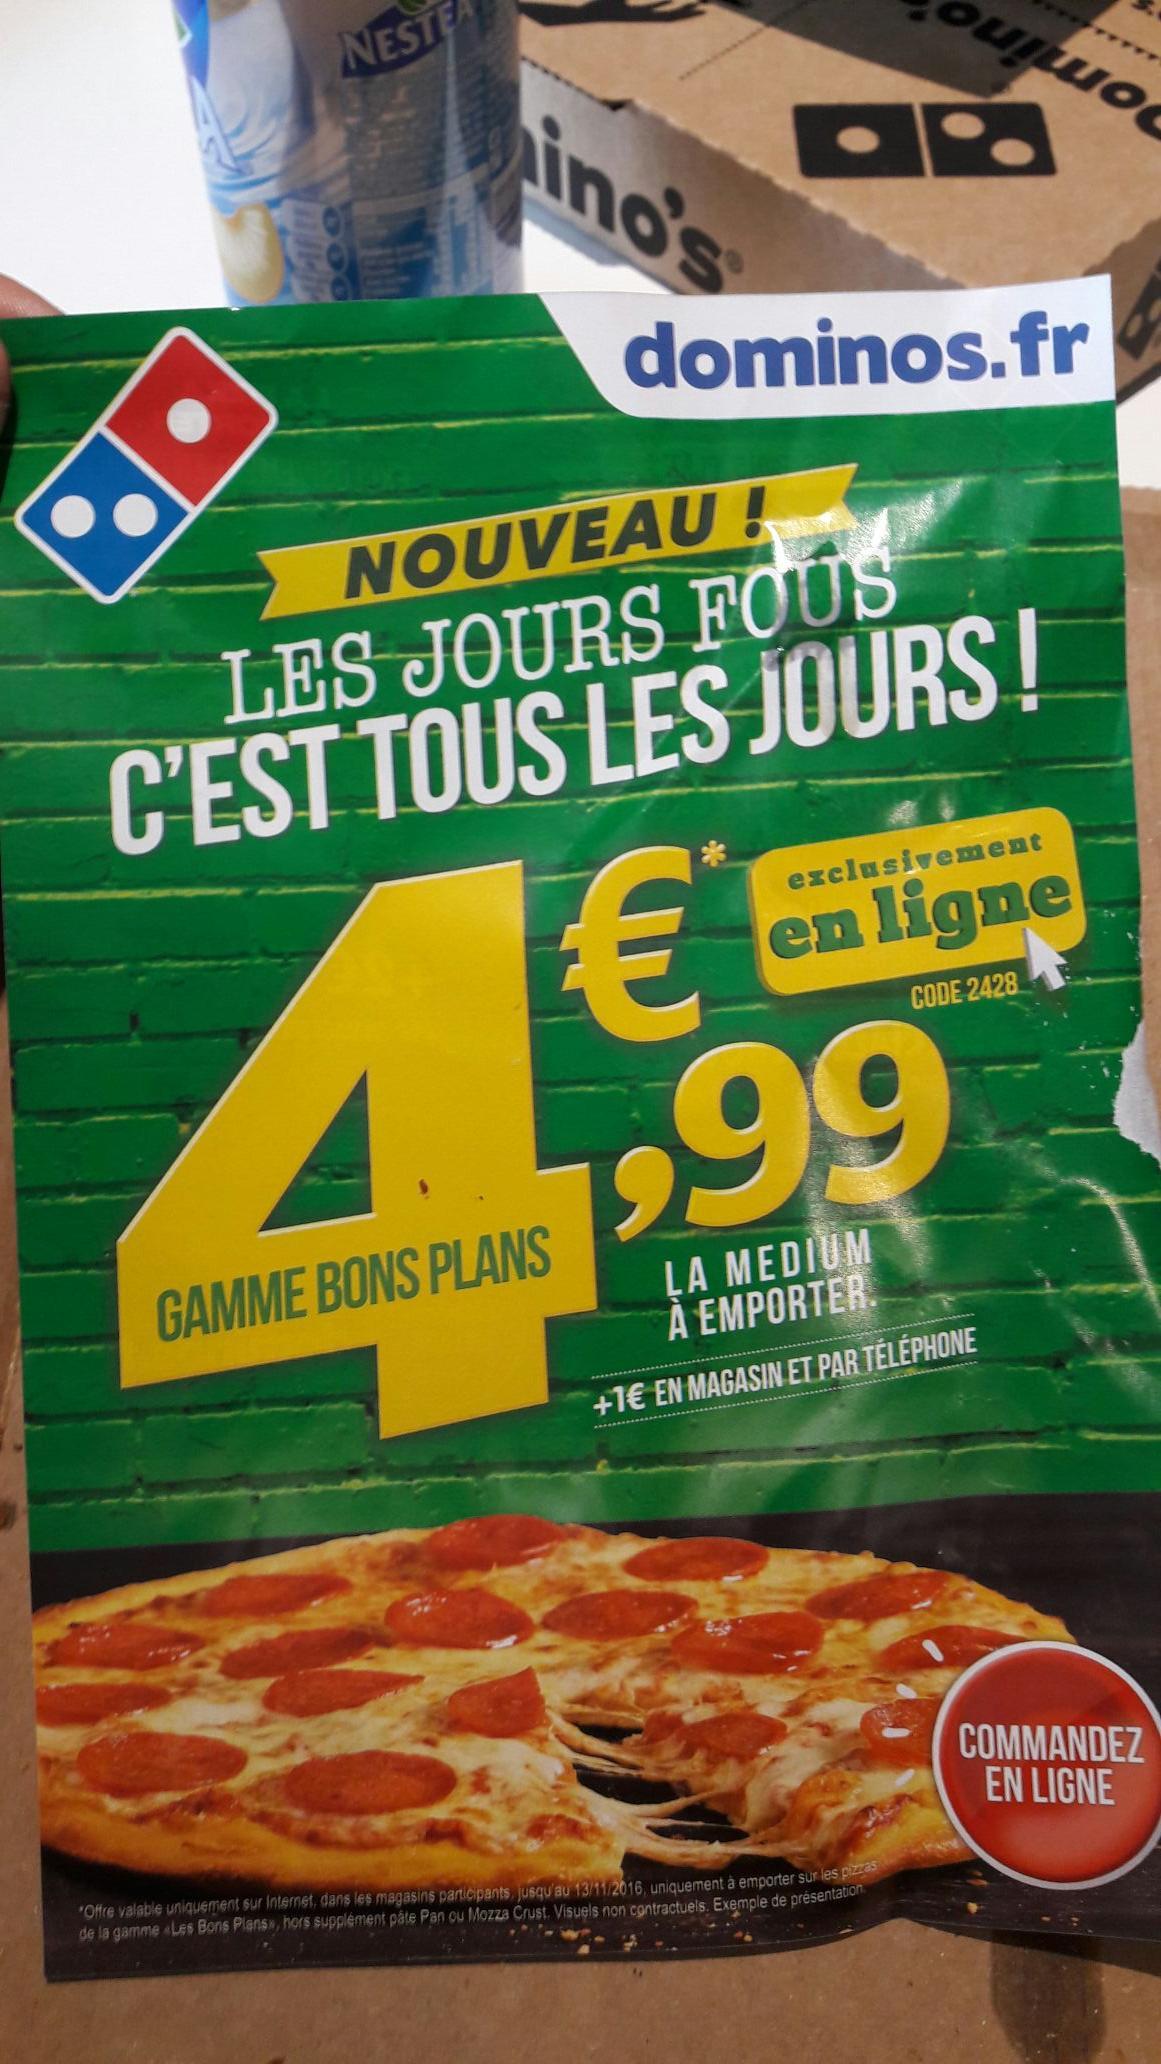 Pizza dominos medium à emporter